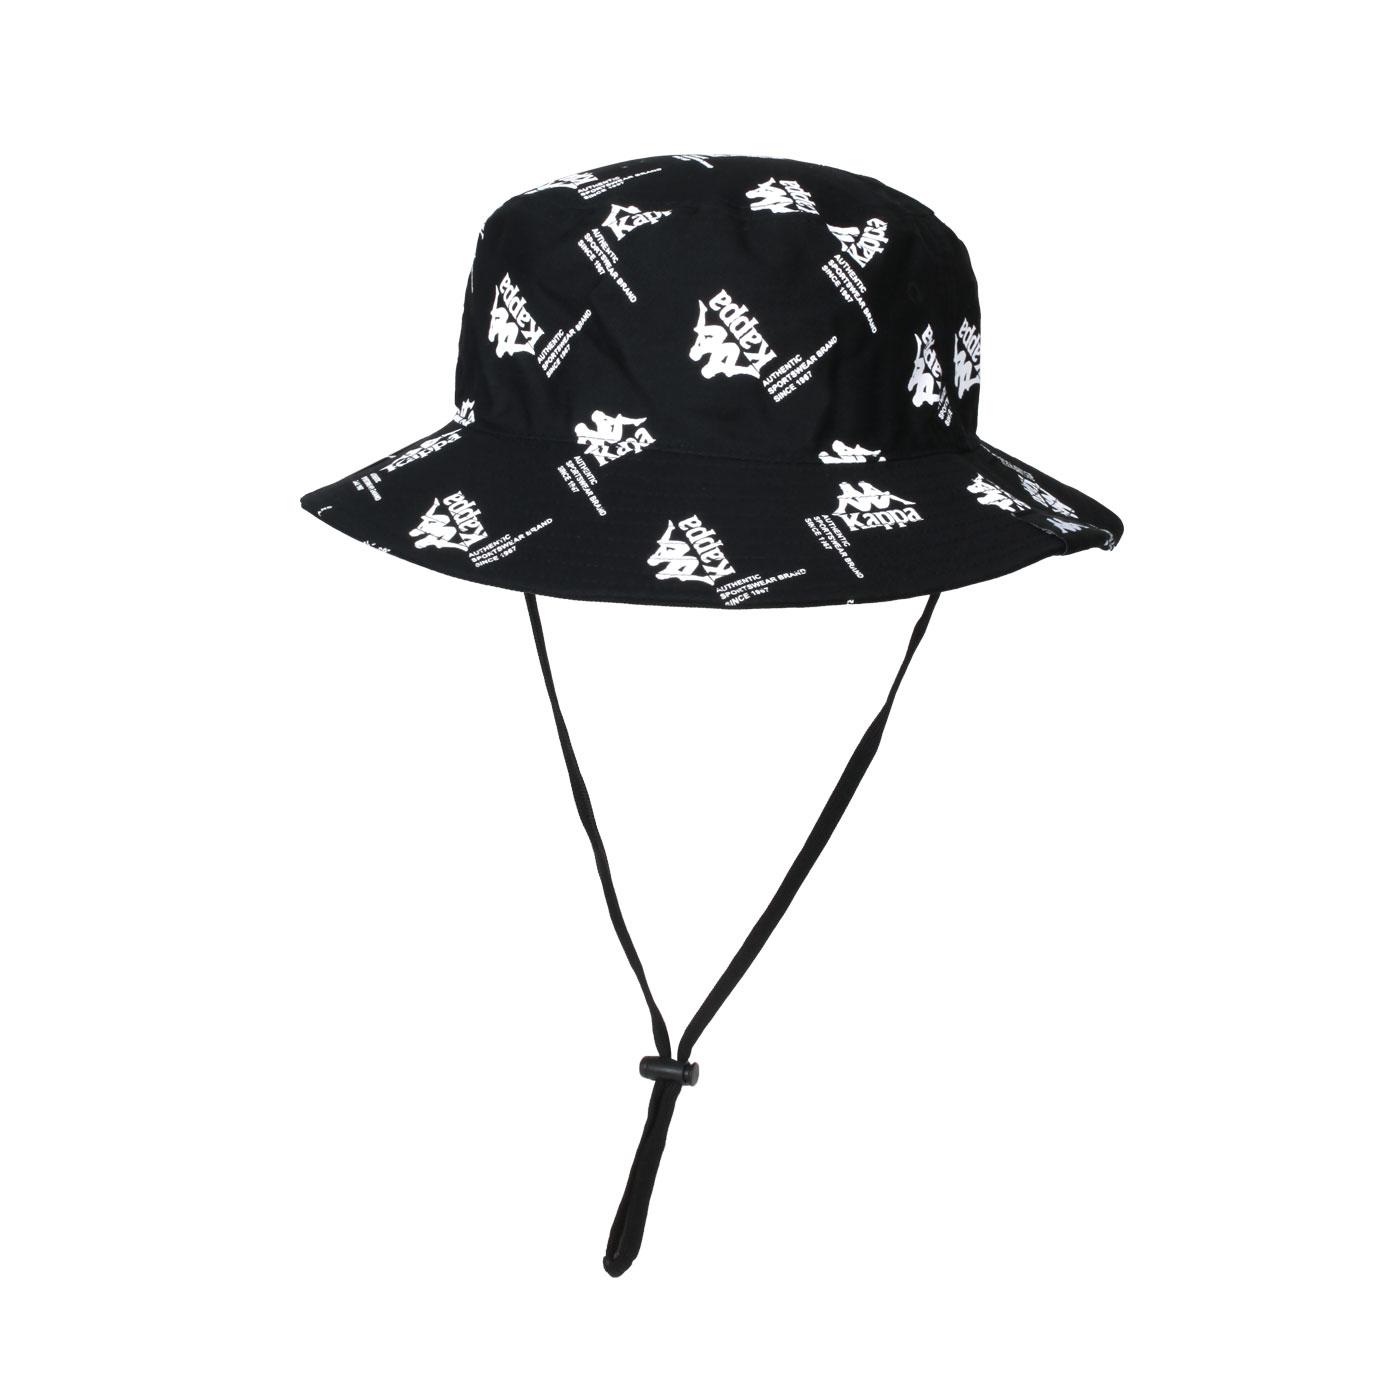 KAPPA 漁夫帽 321937W-005 - 黑白